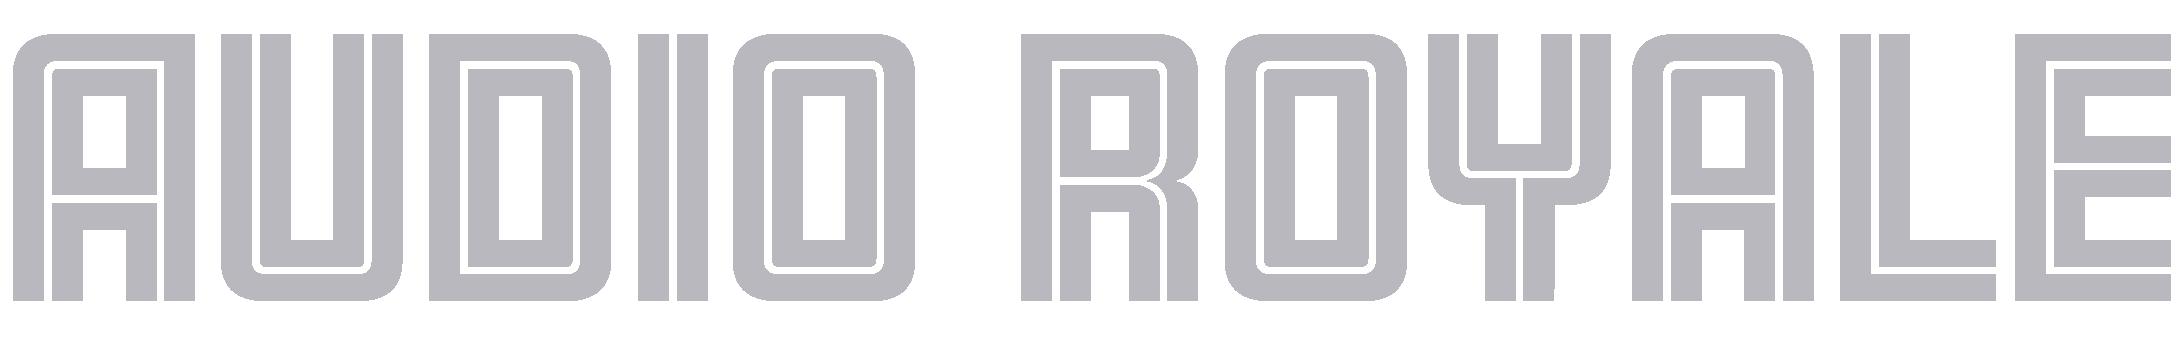 Get Audio Royale